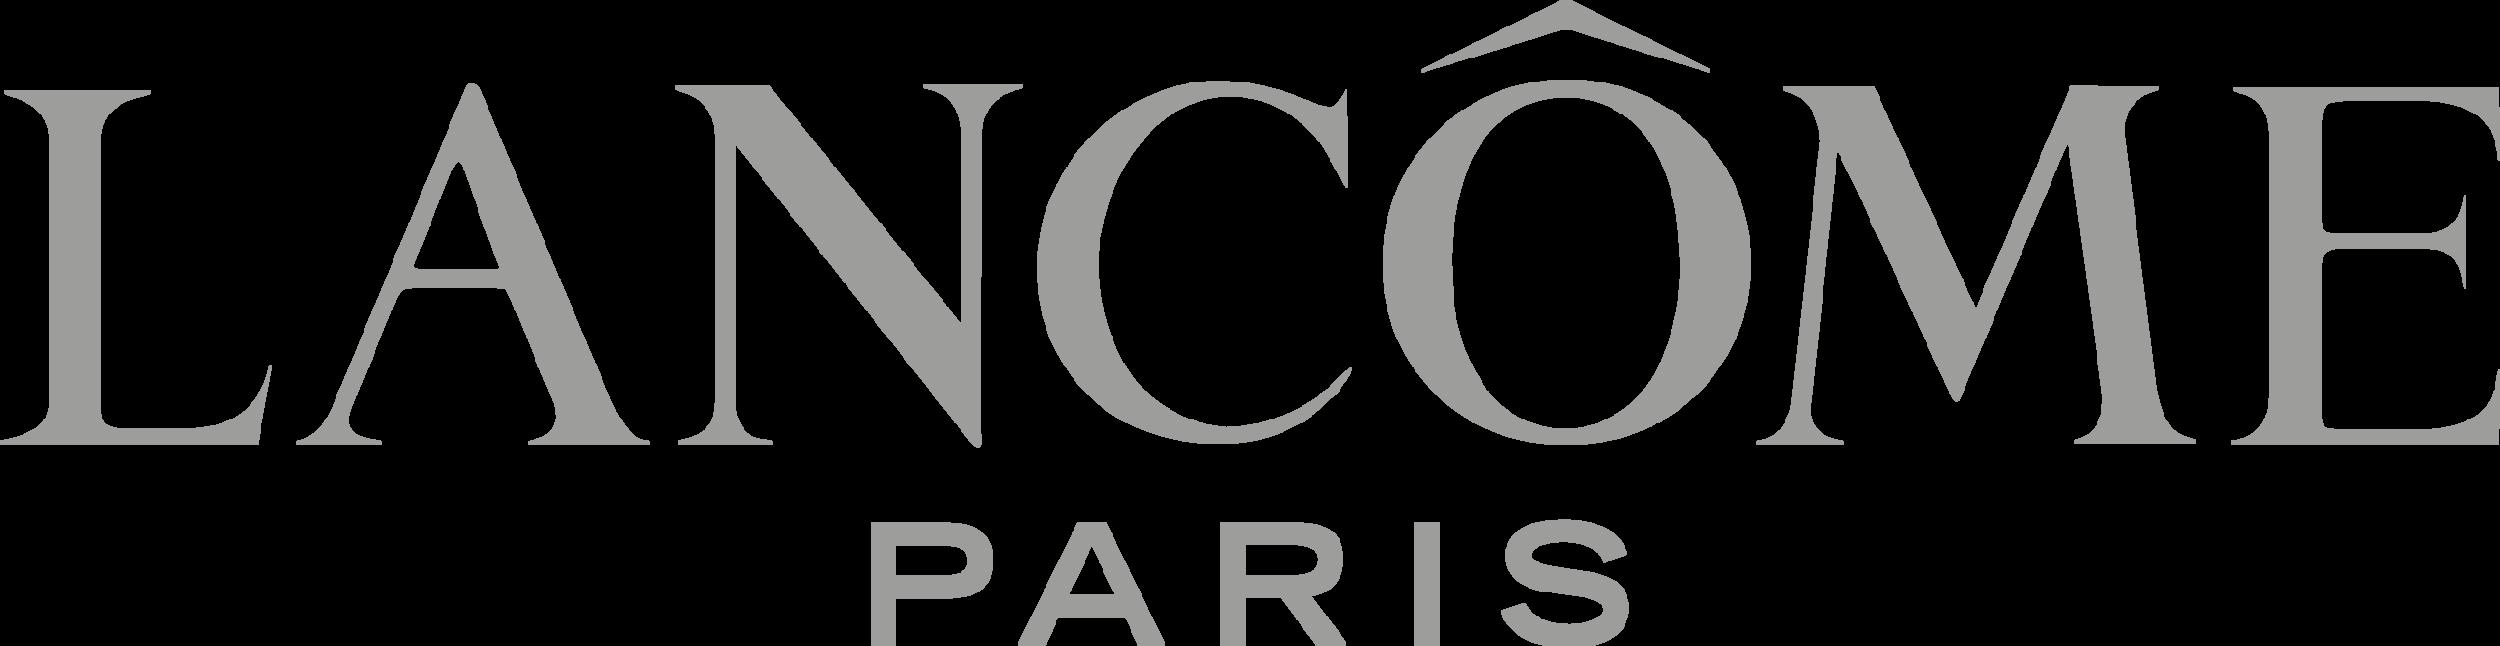 Copy of Lancôme